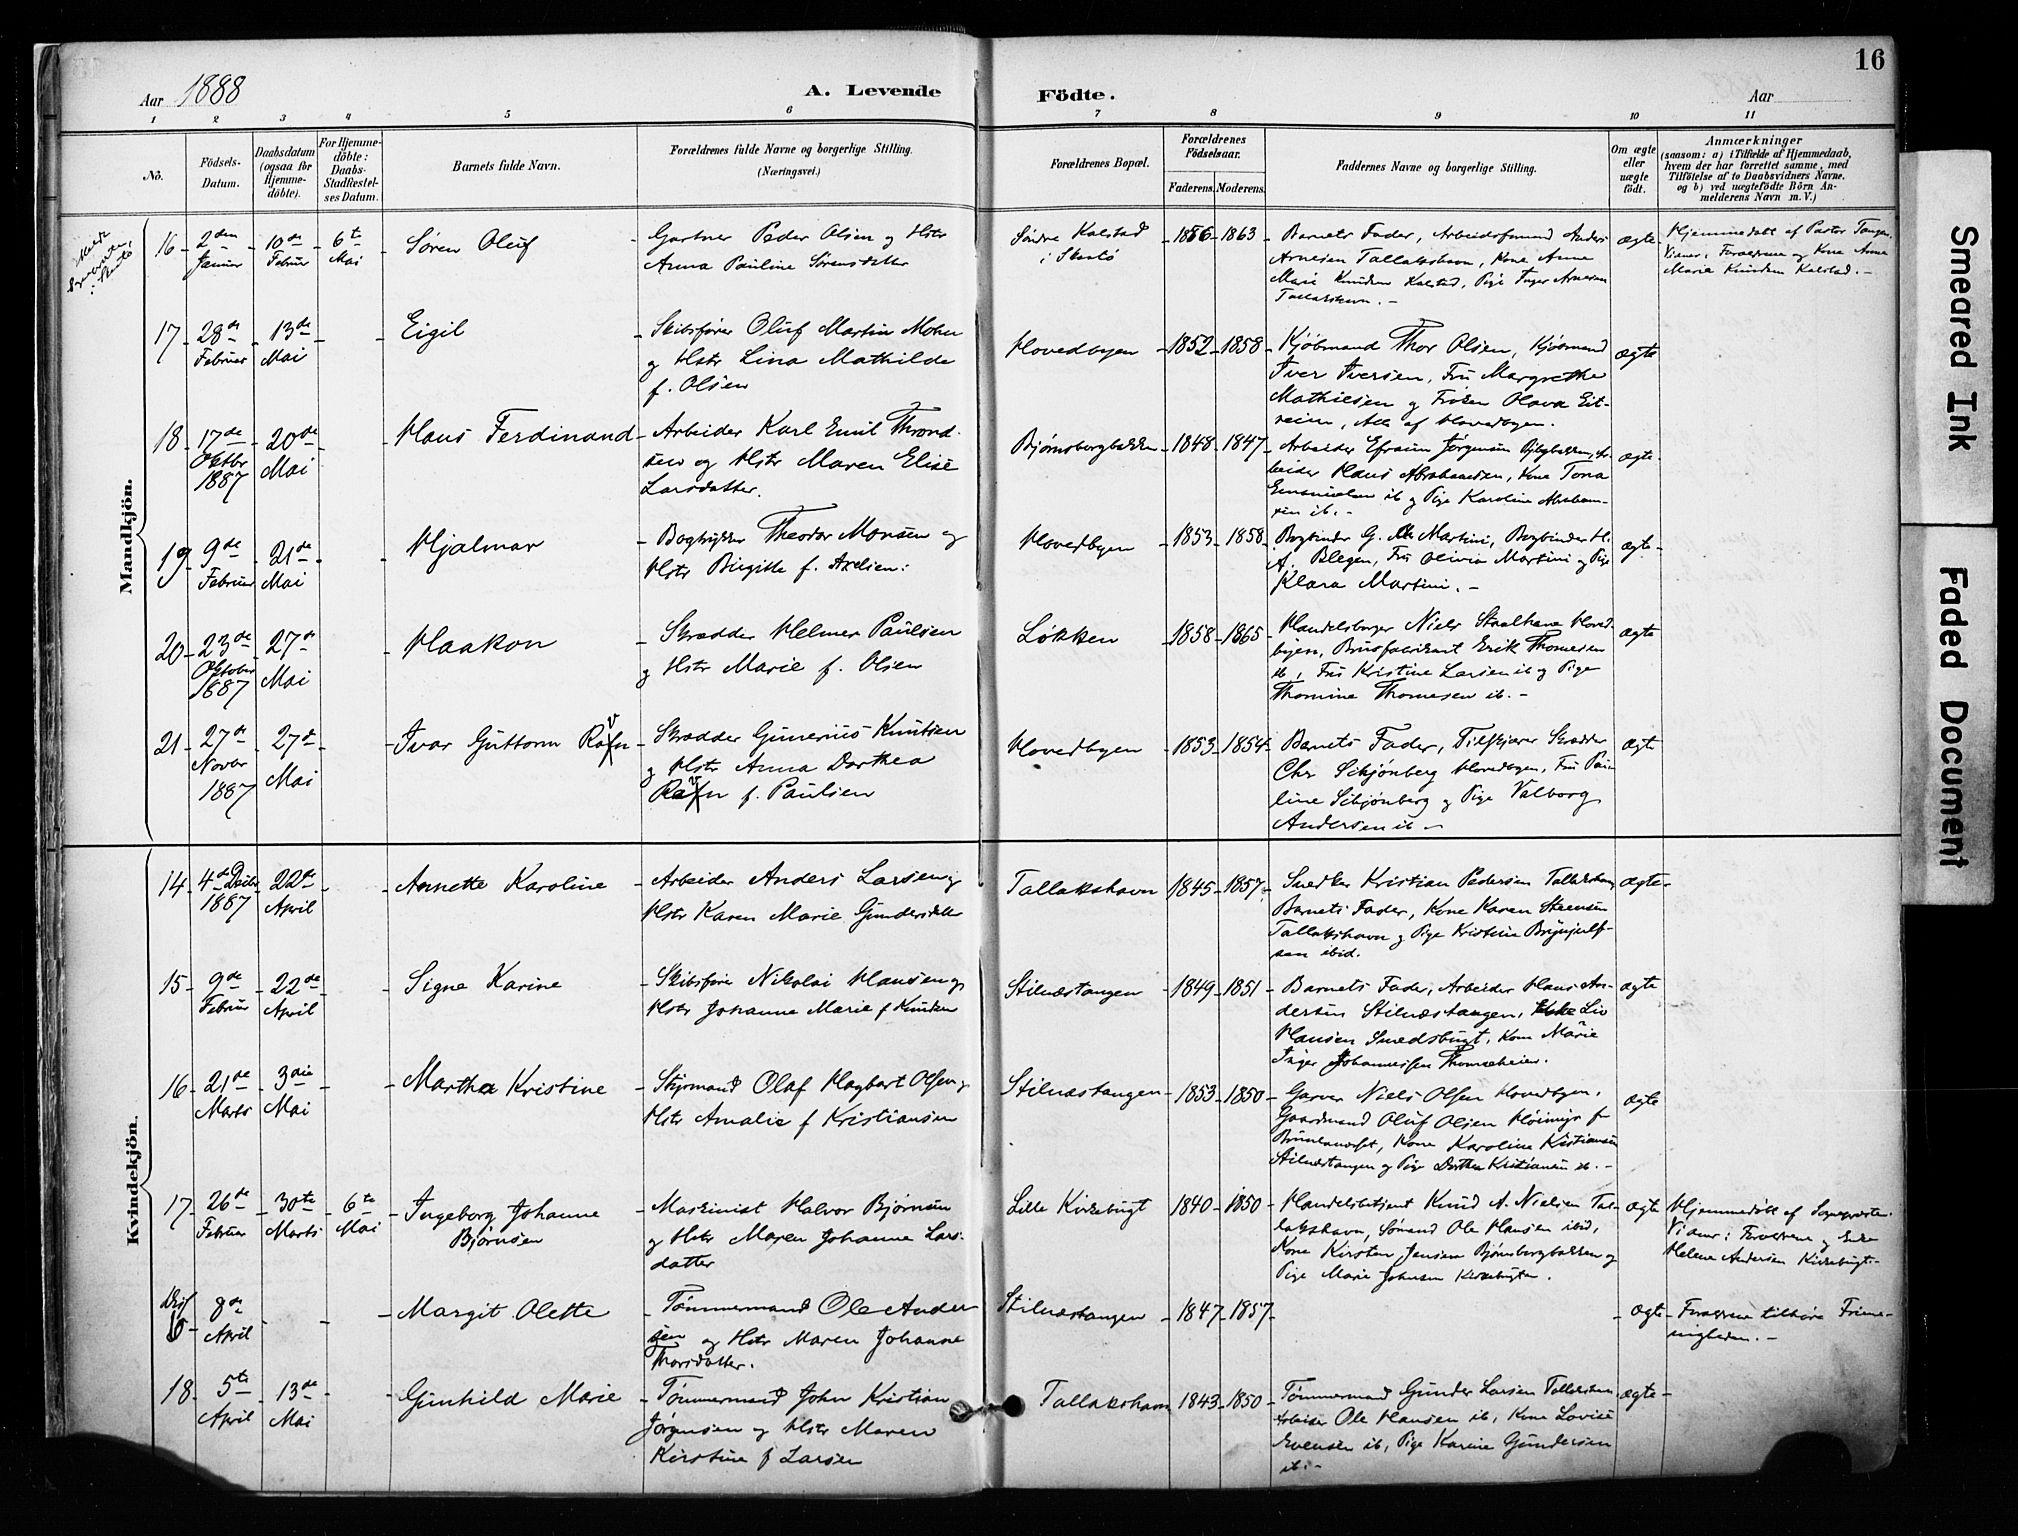 SAKO, Kragerø kirkebøker, F/Fa/L0013: Ministerialbok nr. I 13, 1887-1915, s. 16